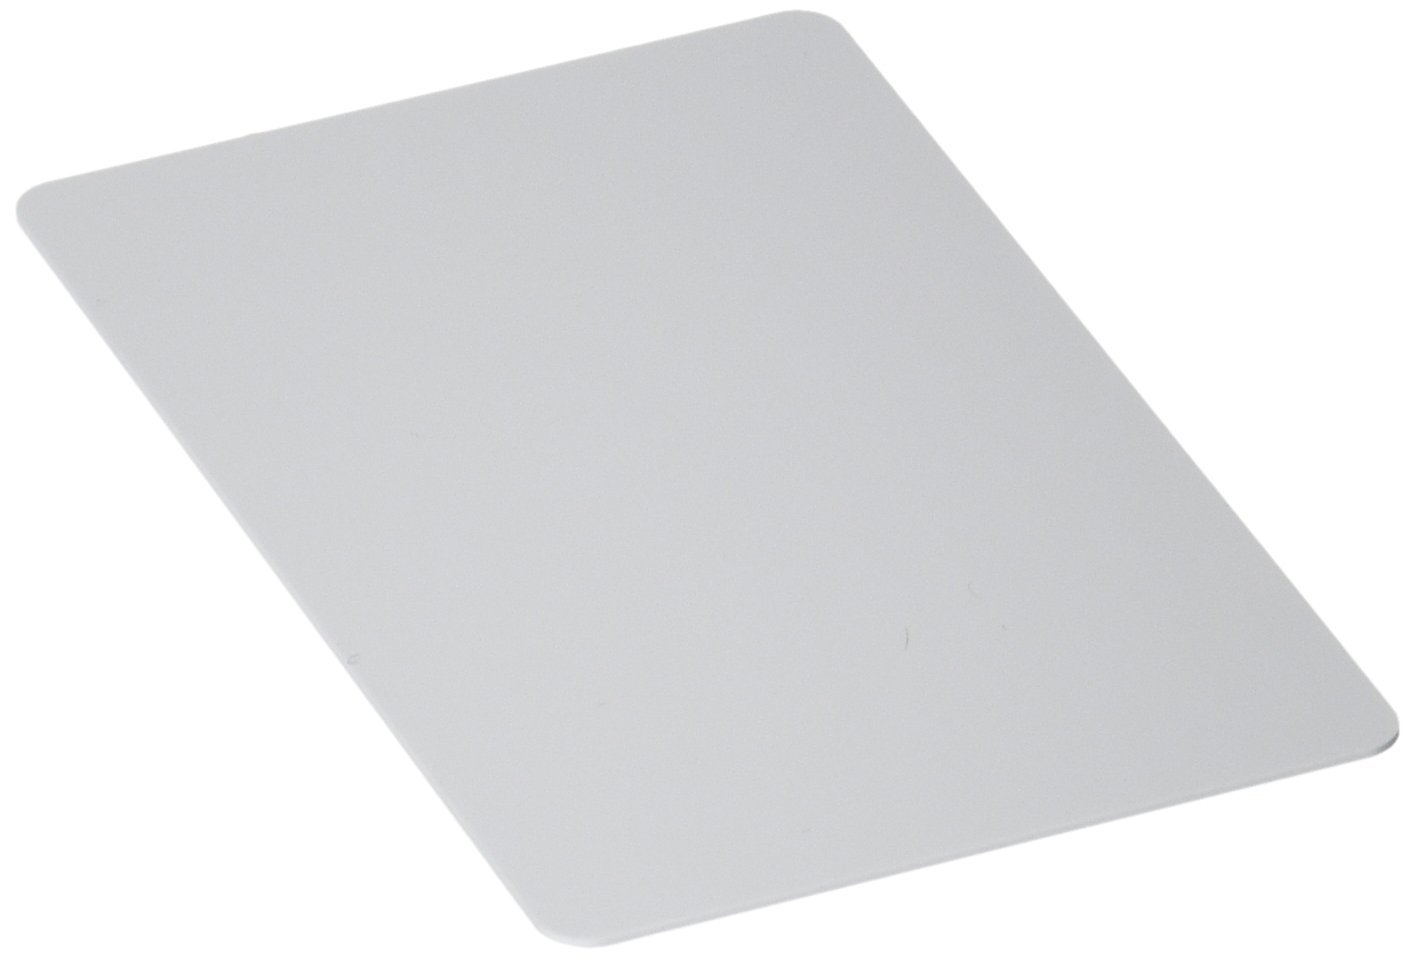 Ultracard 30 Mil Pvc Cards Cr80, 500 Pack. Fargo Certified Ultracard Pvc Cards ( Fargo Electronics 81754 681808